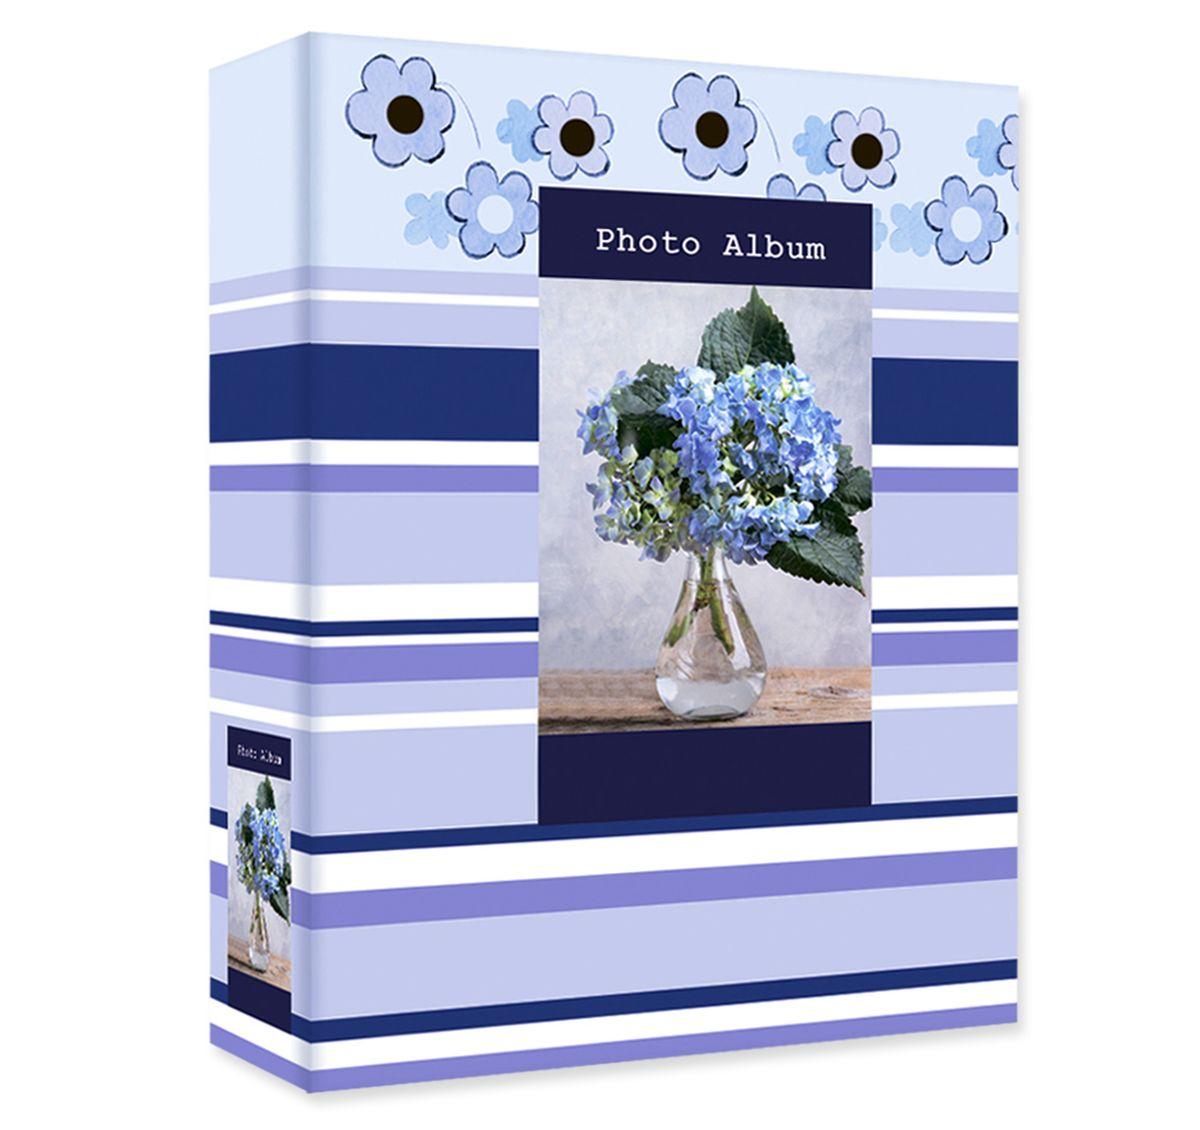 Фотоальбом Pioneer Early Spring, 100 фотографий, 10 х 15 см, цвет: голубой фотоальбом окно цвет голубой 100 фотографий 10 х 15 см